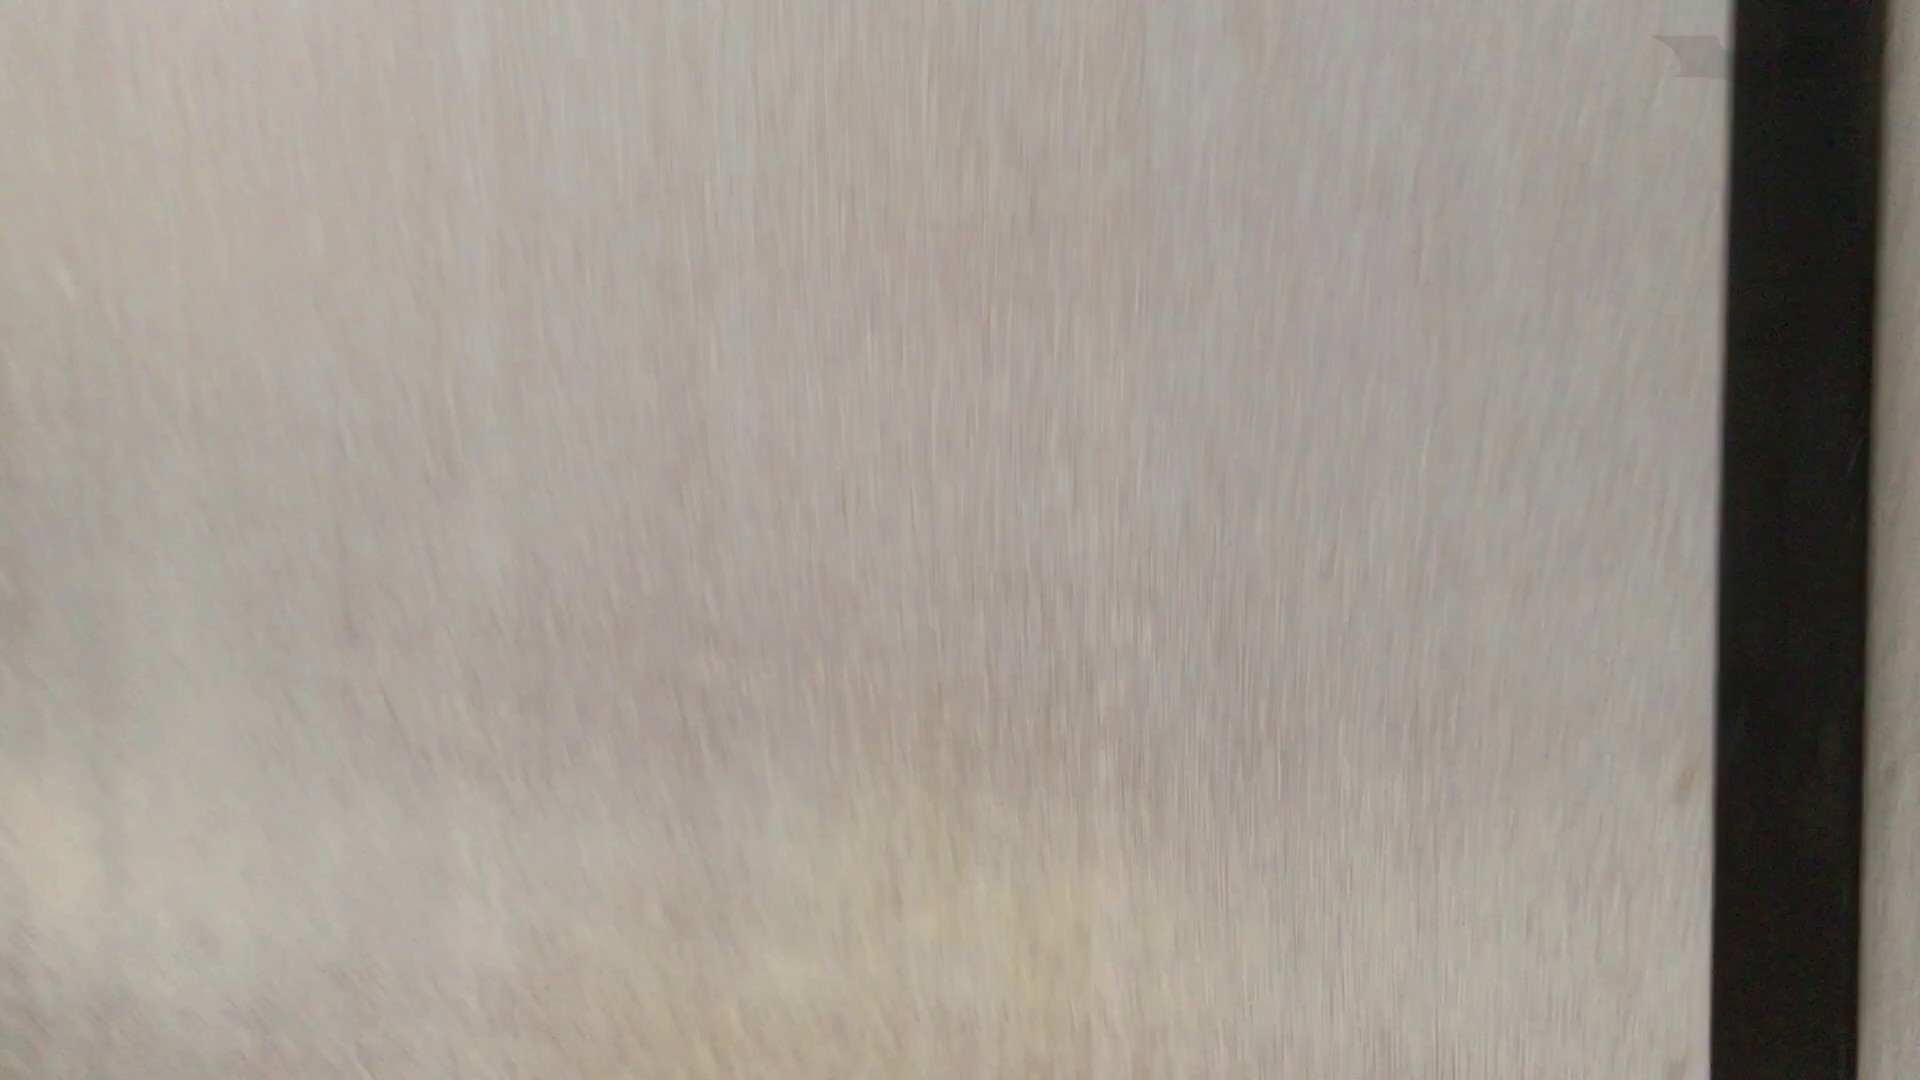 芸術大学ガチ潜入盗sati JD盗撮 美女の洗面所の秘密 Vol.95 盛合せ 戯れ無修正画像 100画像 3